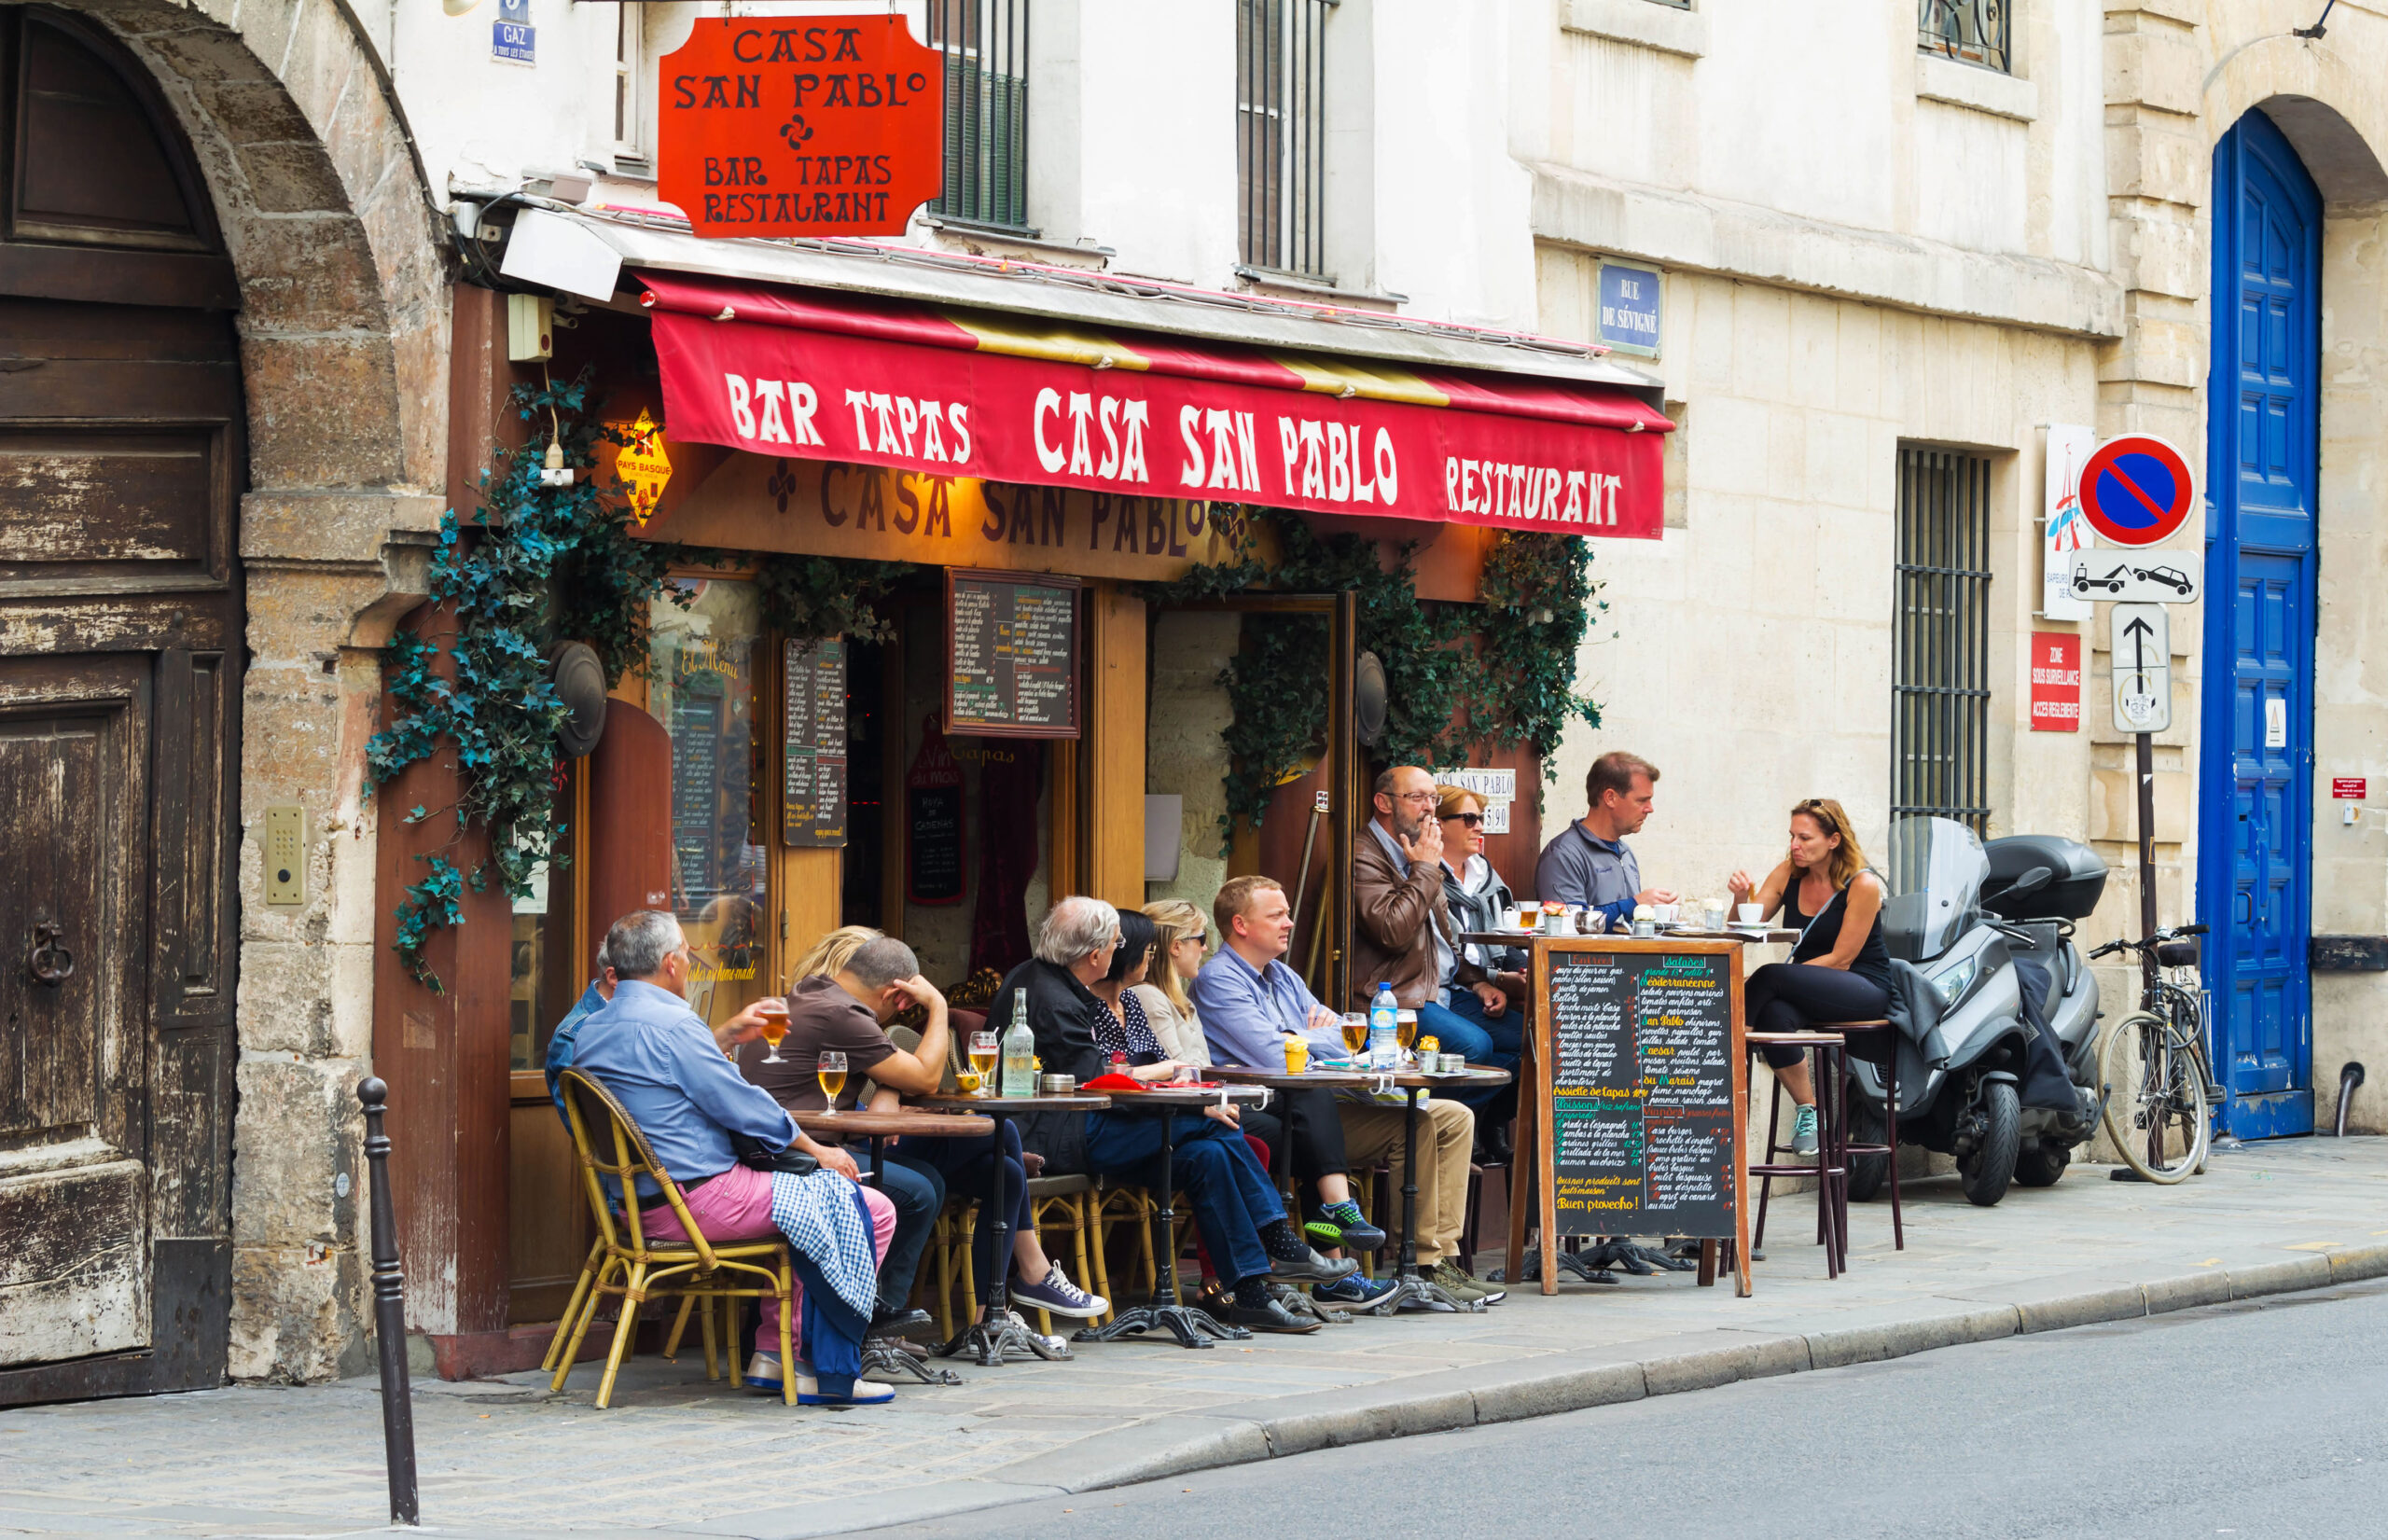 vinpriser vin alkohol Paris Frankrike vinbar